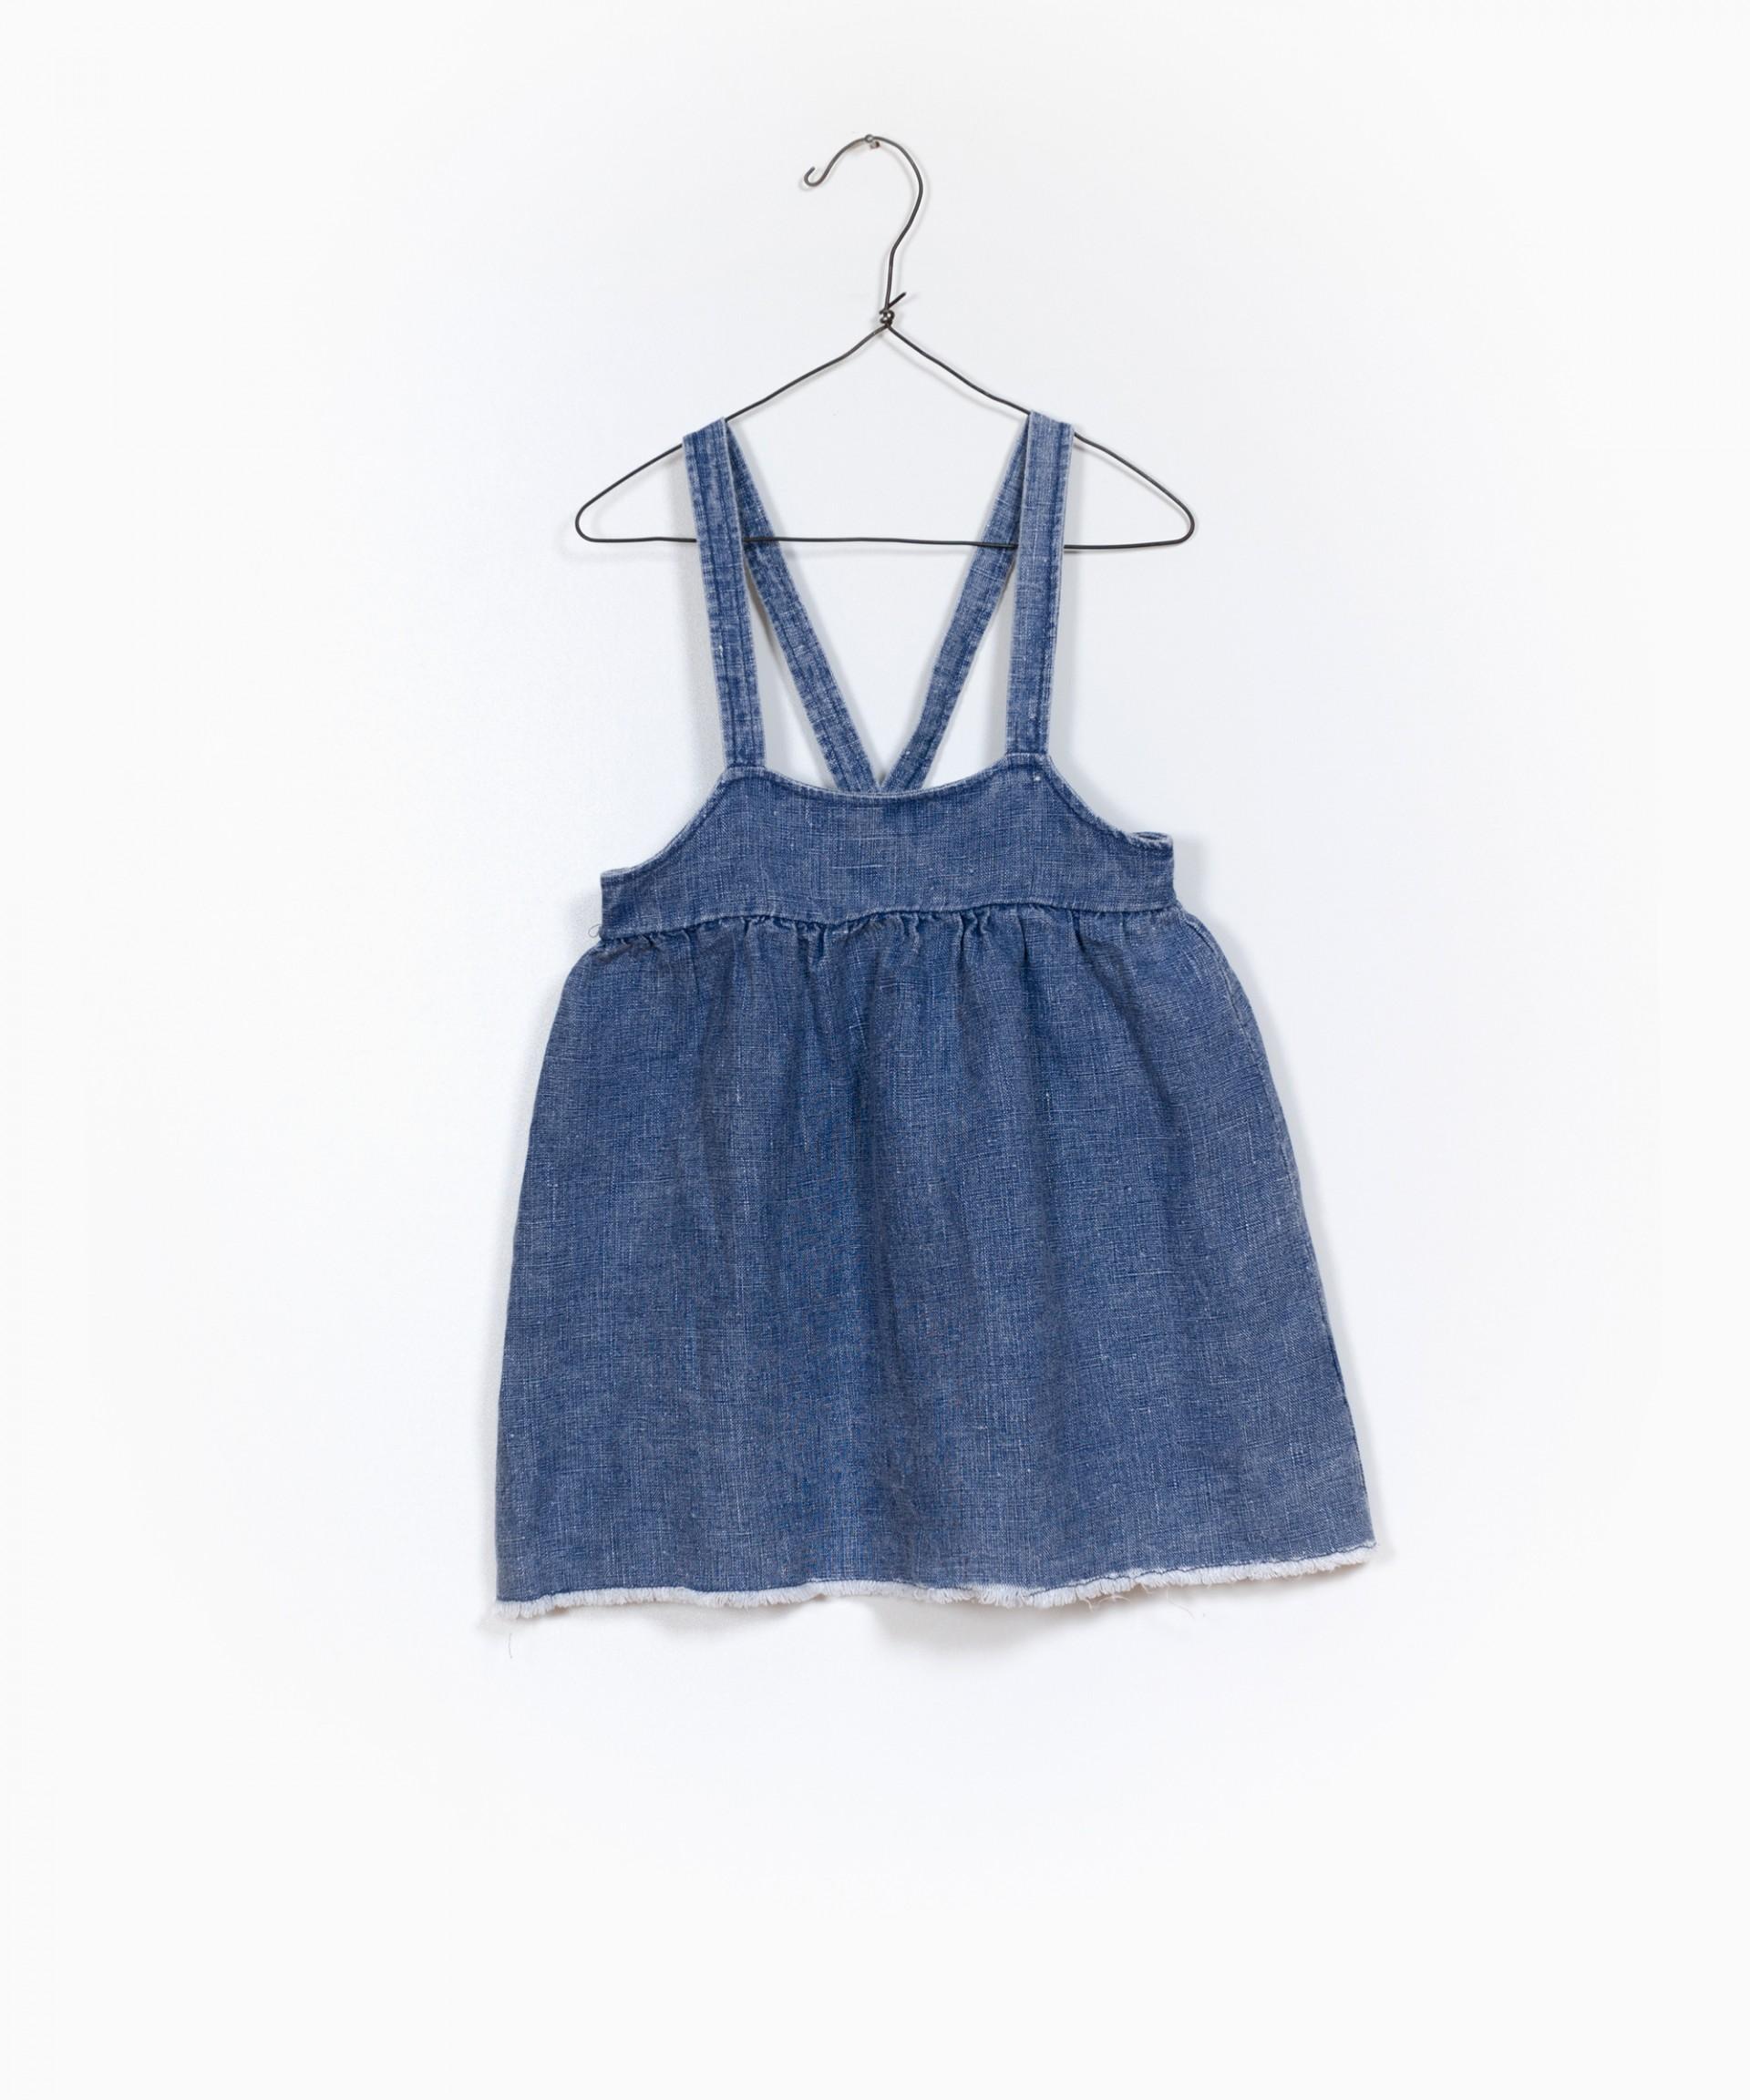 Woven Dungaree Skirt